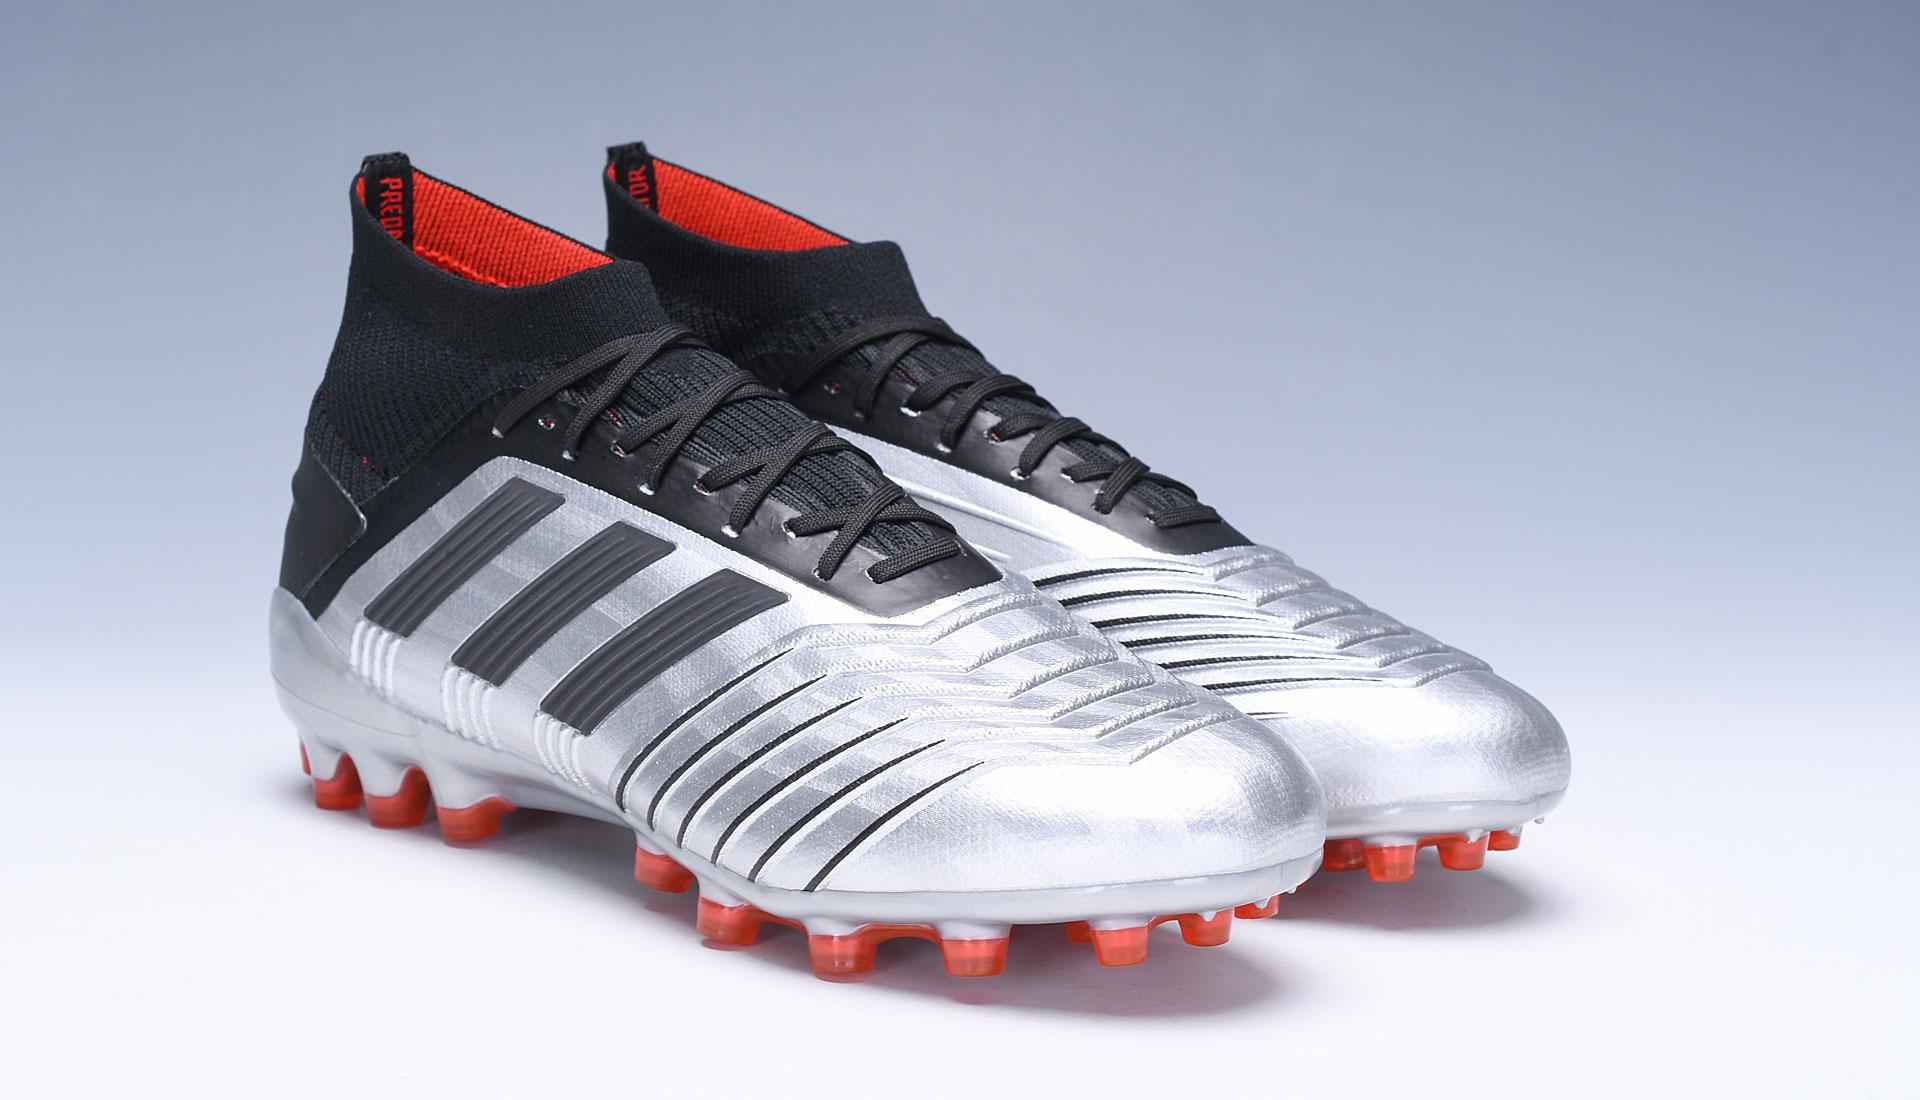 adidas Predator 19.1 AG Silver Red Football Boots shop